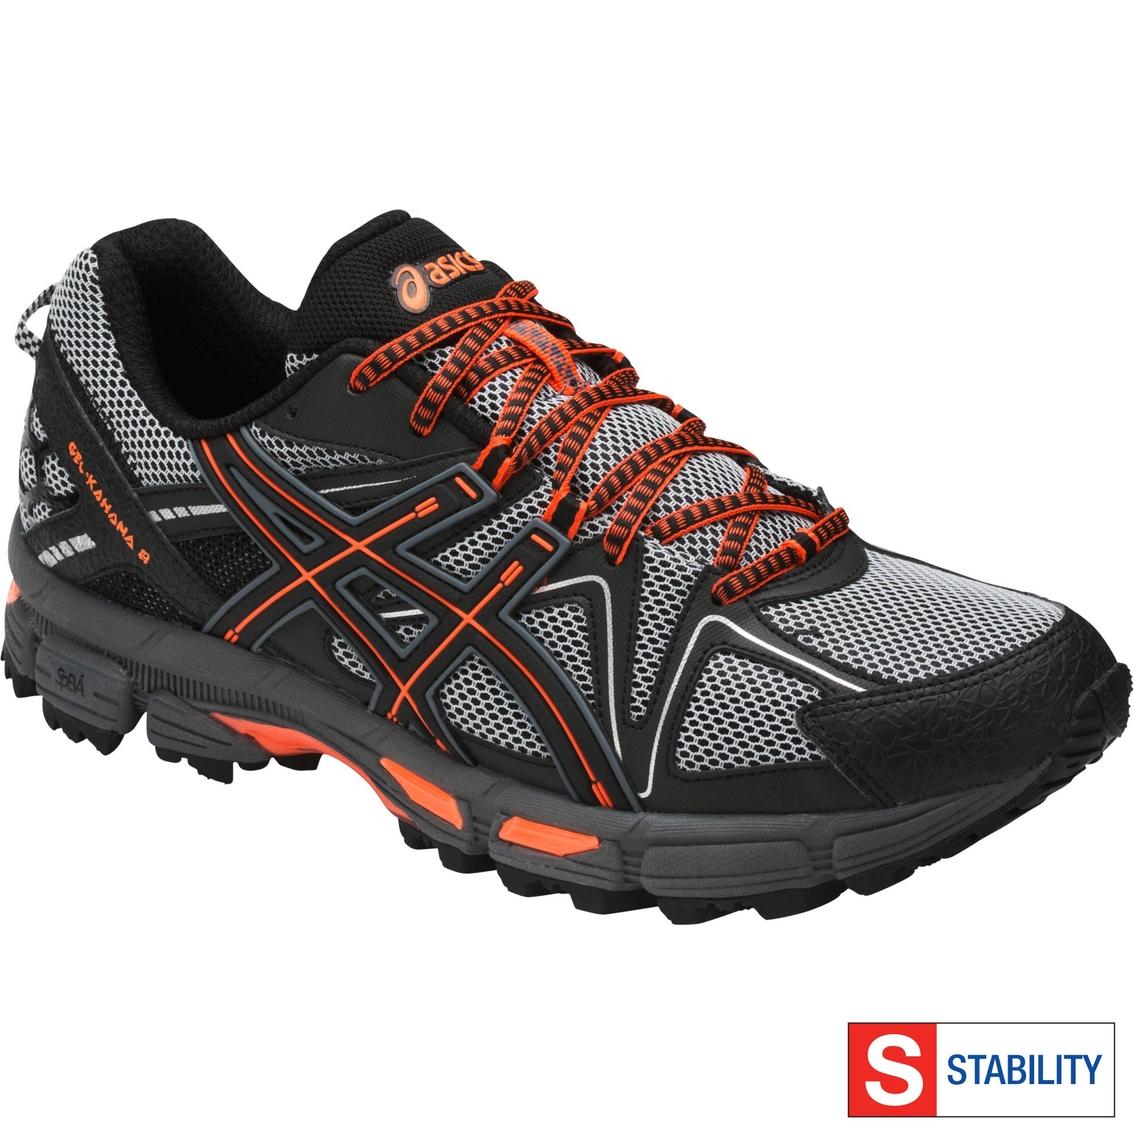 bd9fb4c6d72 Asics Men s Gel Kahana 8 Trail Running Shoes